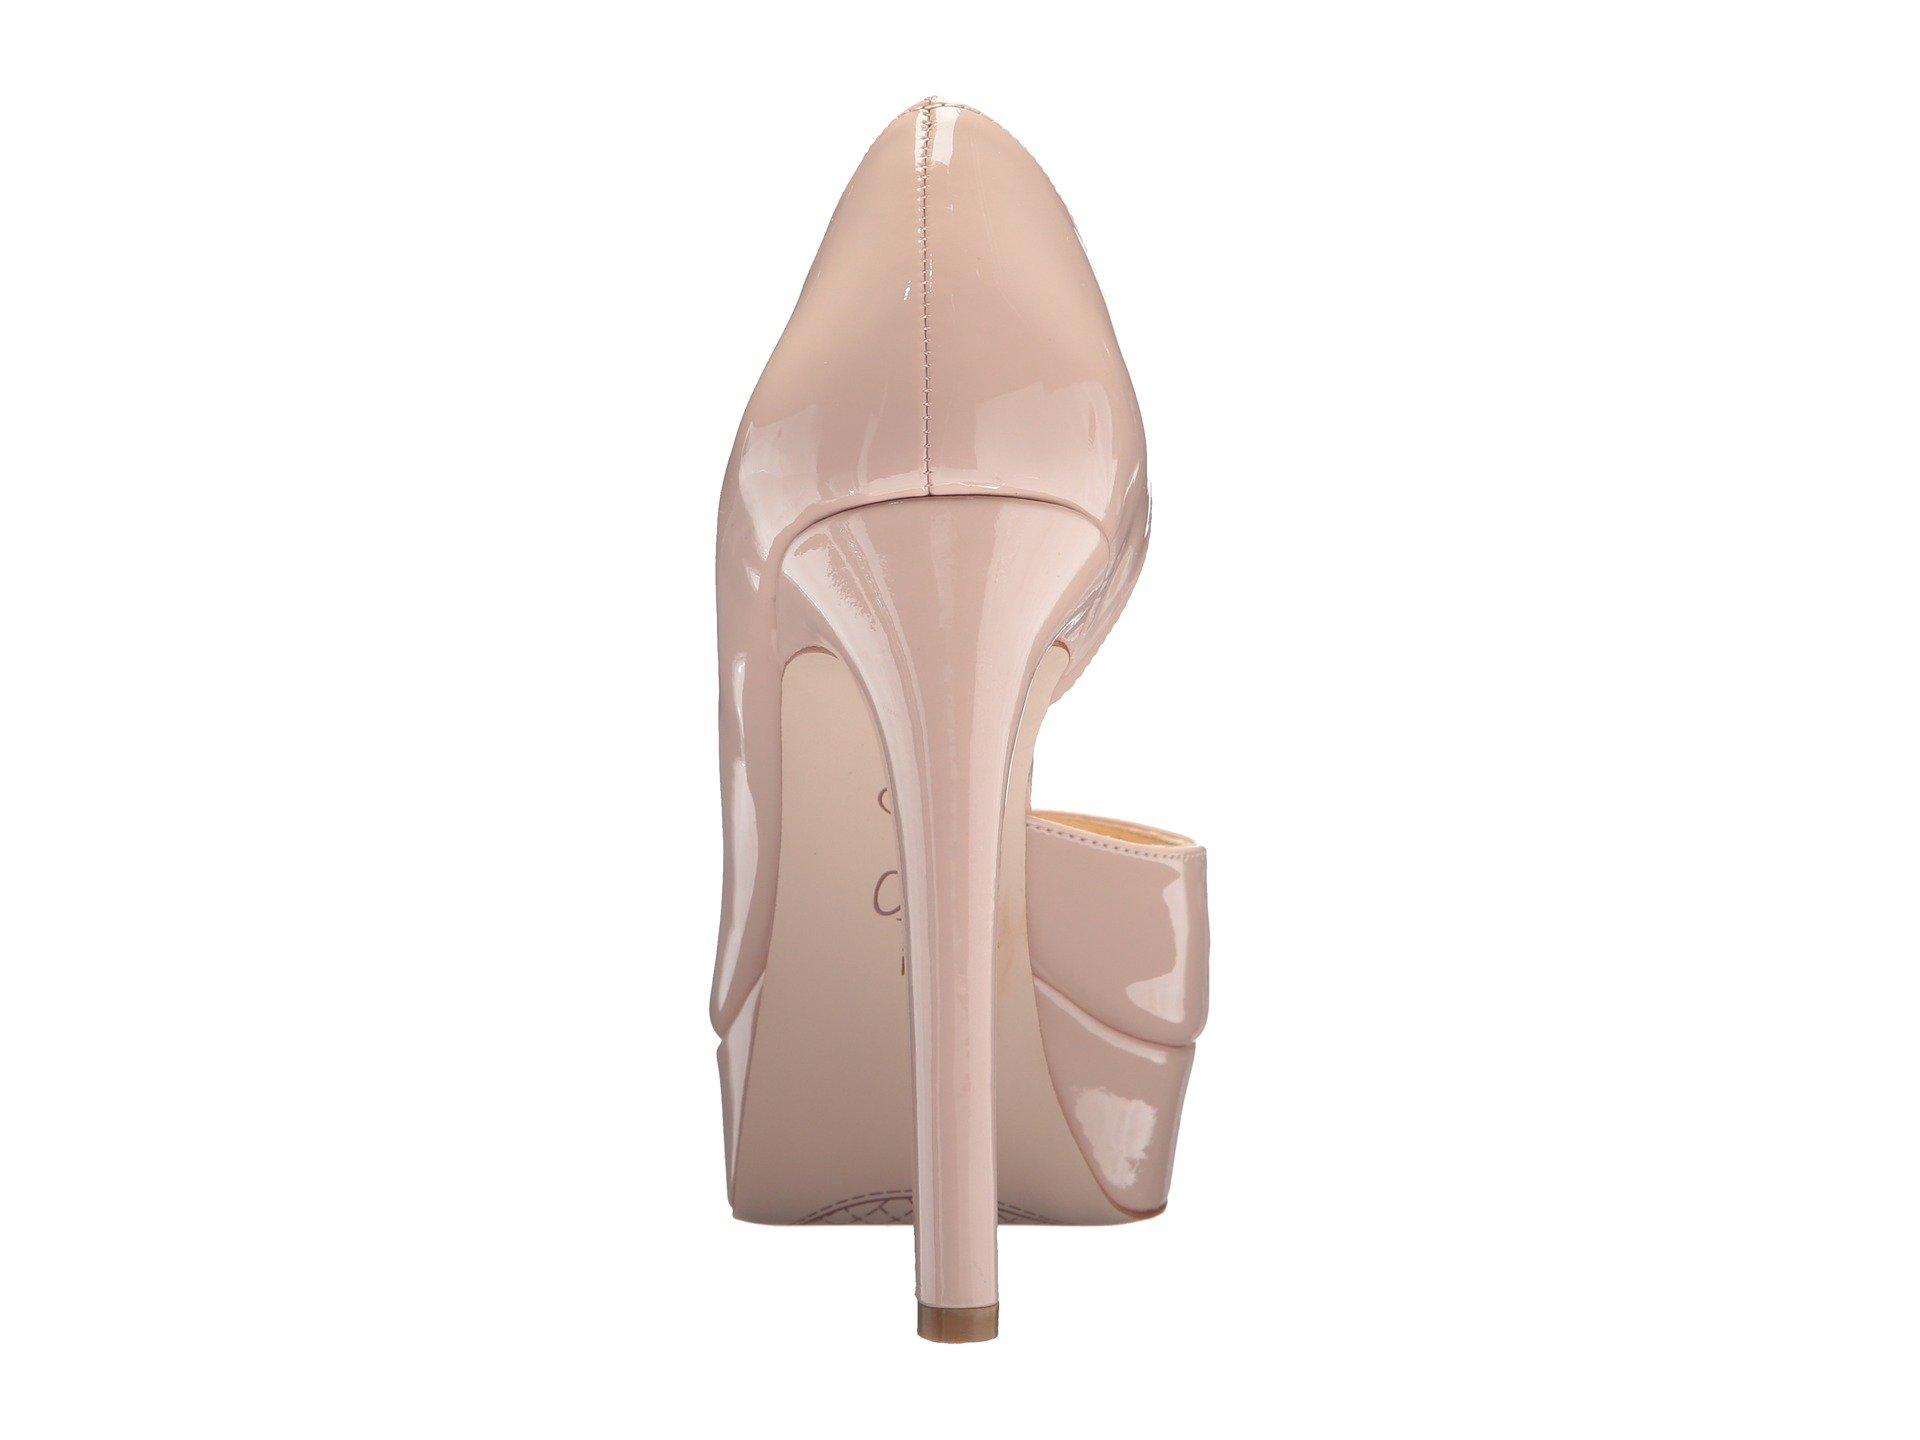 Jessica-Simpson-Martella-d-039-Orsay-Peep-Toe-Platform-Pumps thumbnail 9